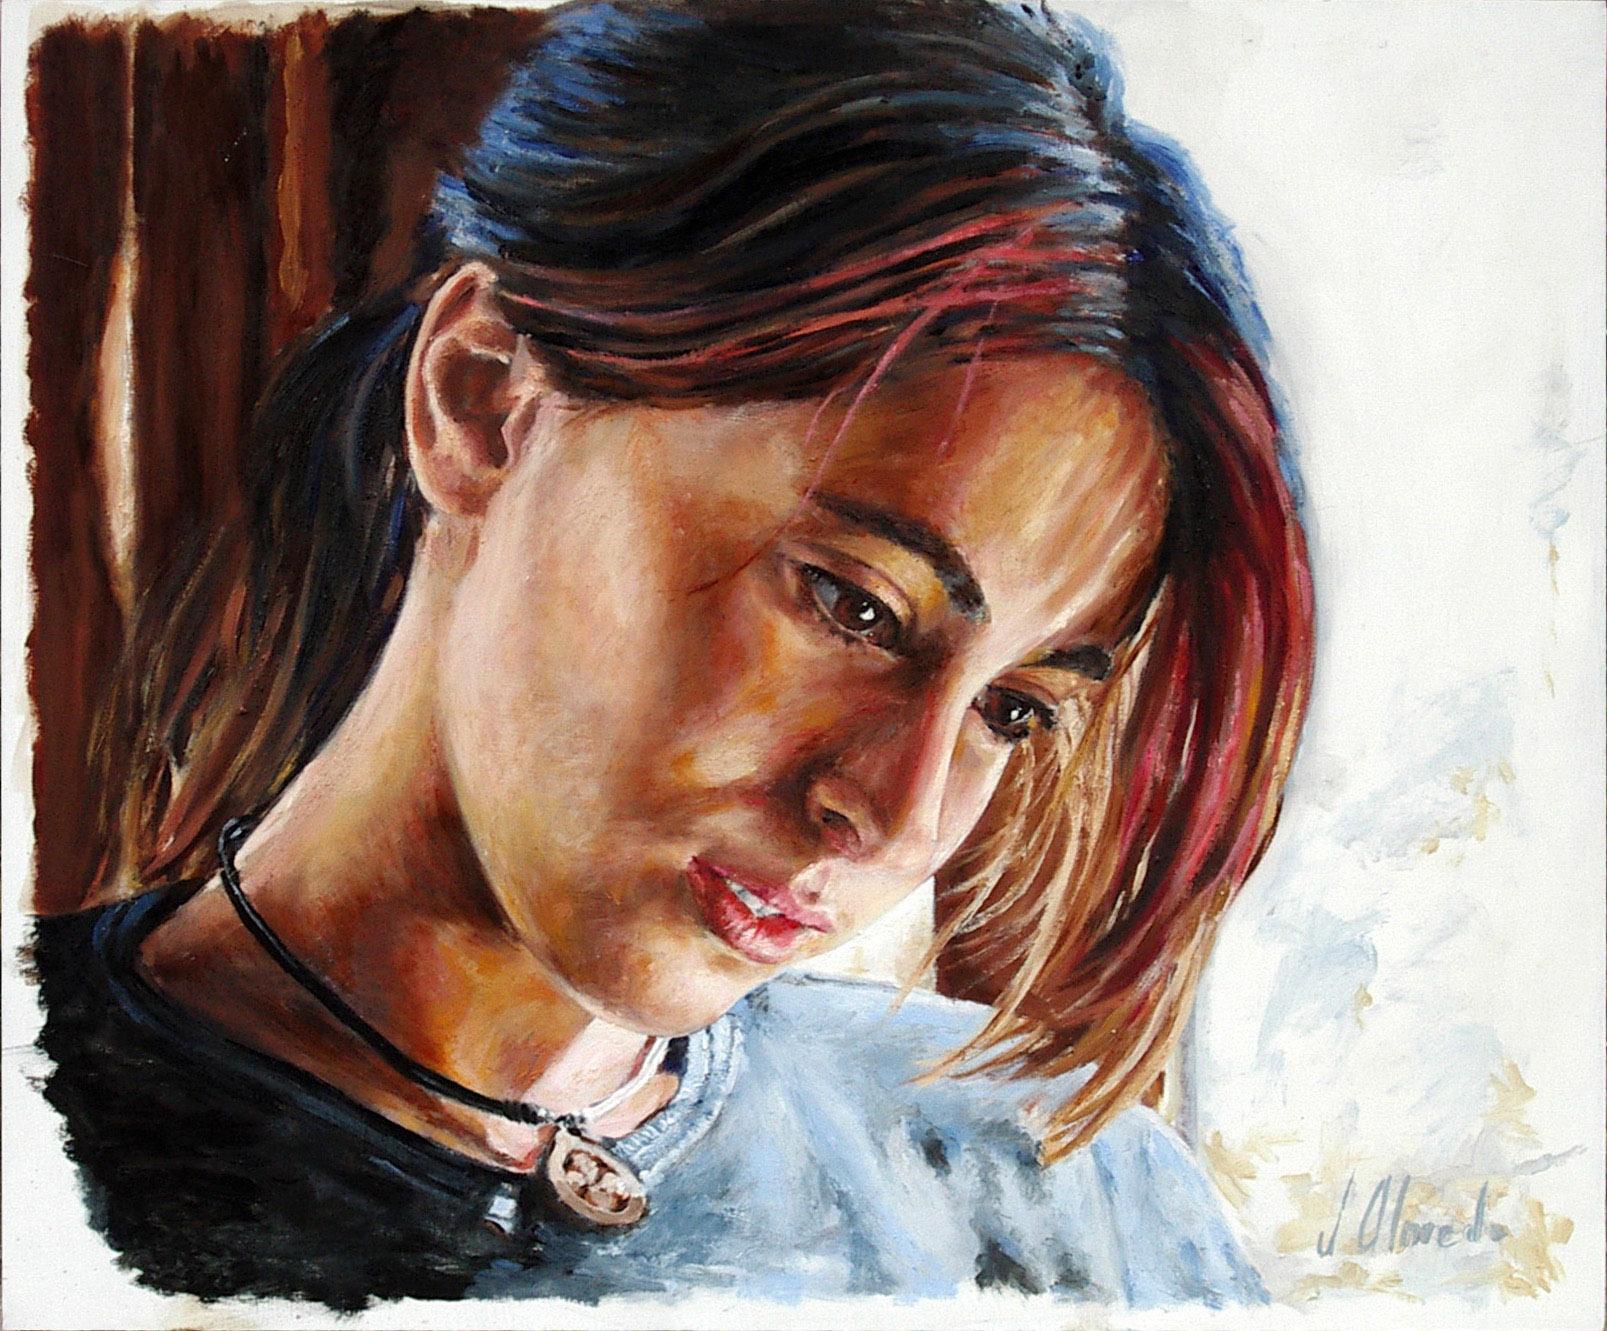 Miriam. Retrato en óleo sobre tabla, Javier Olmedo. 2010